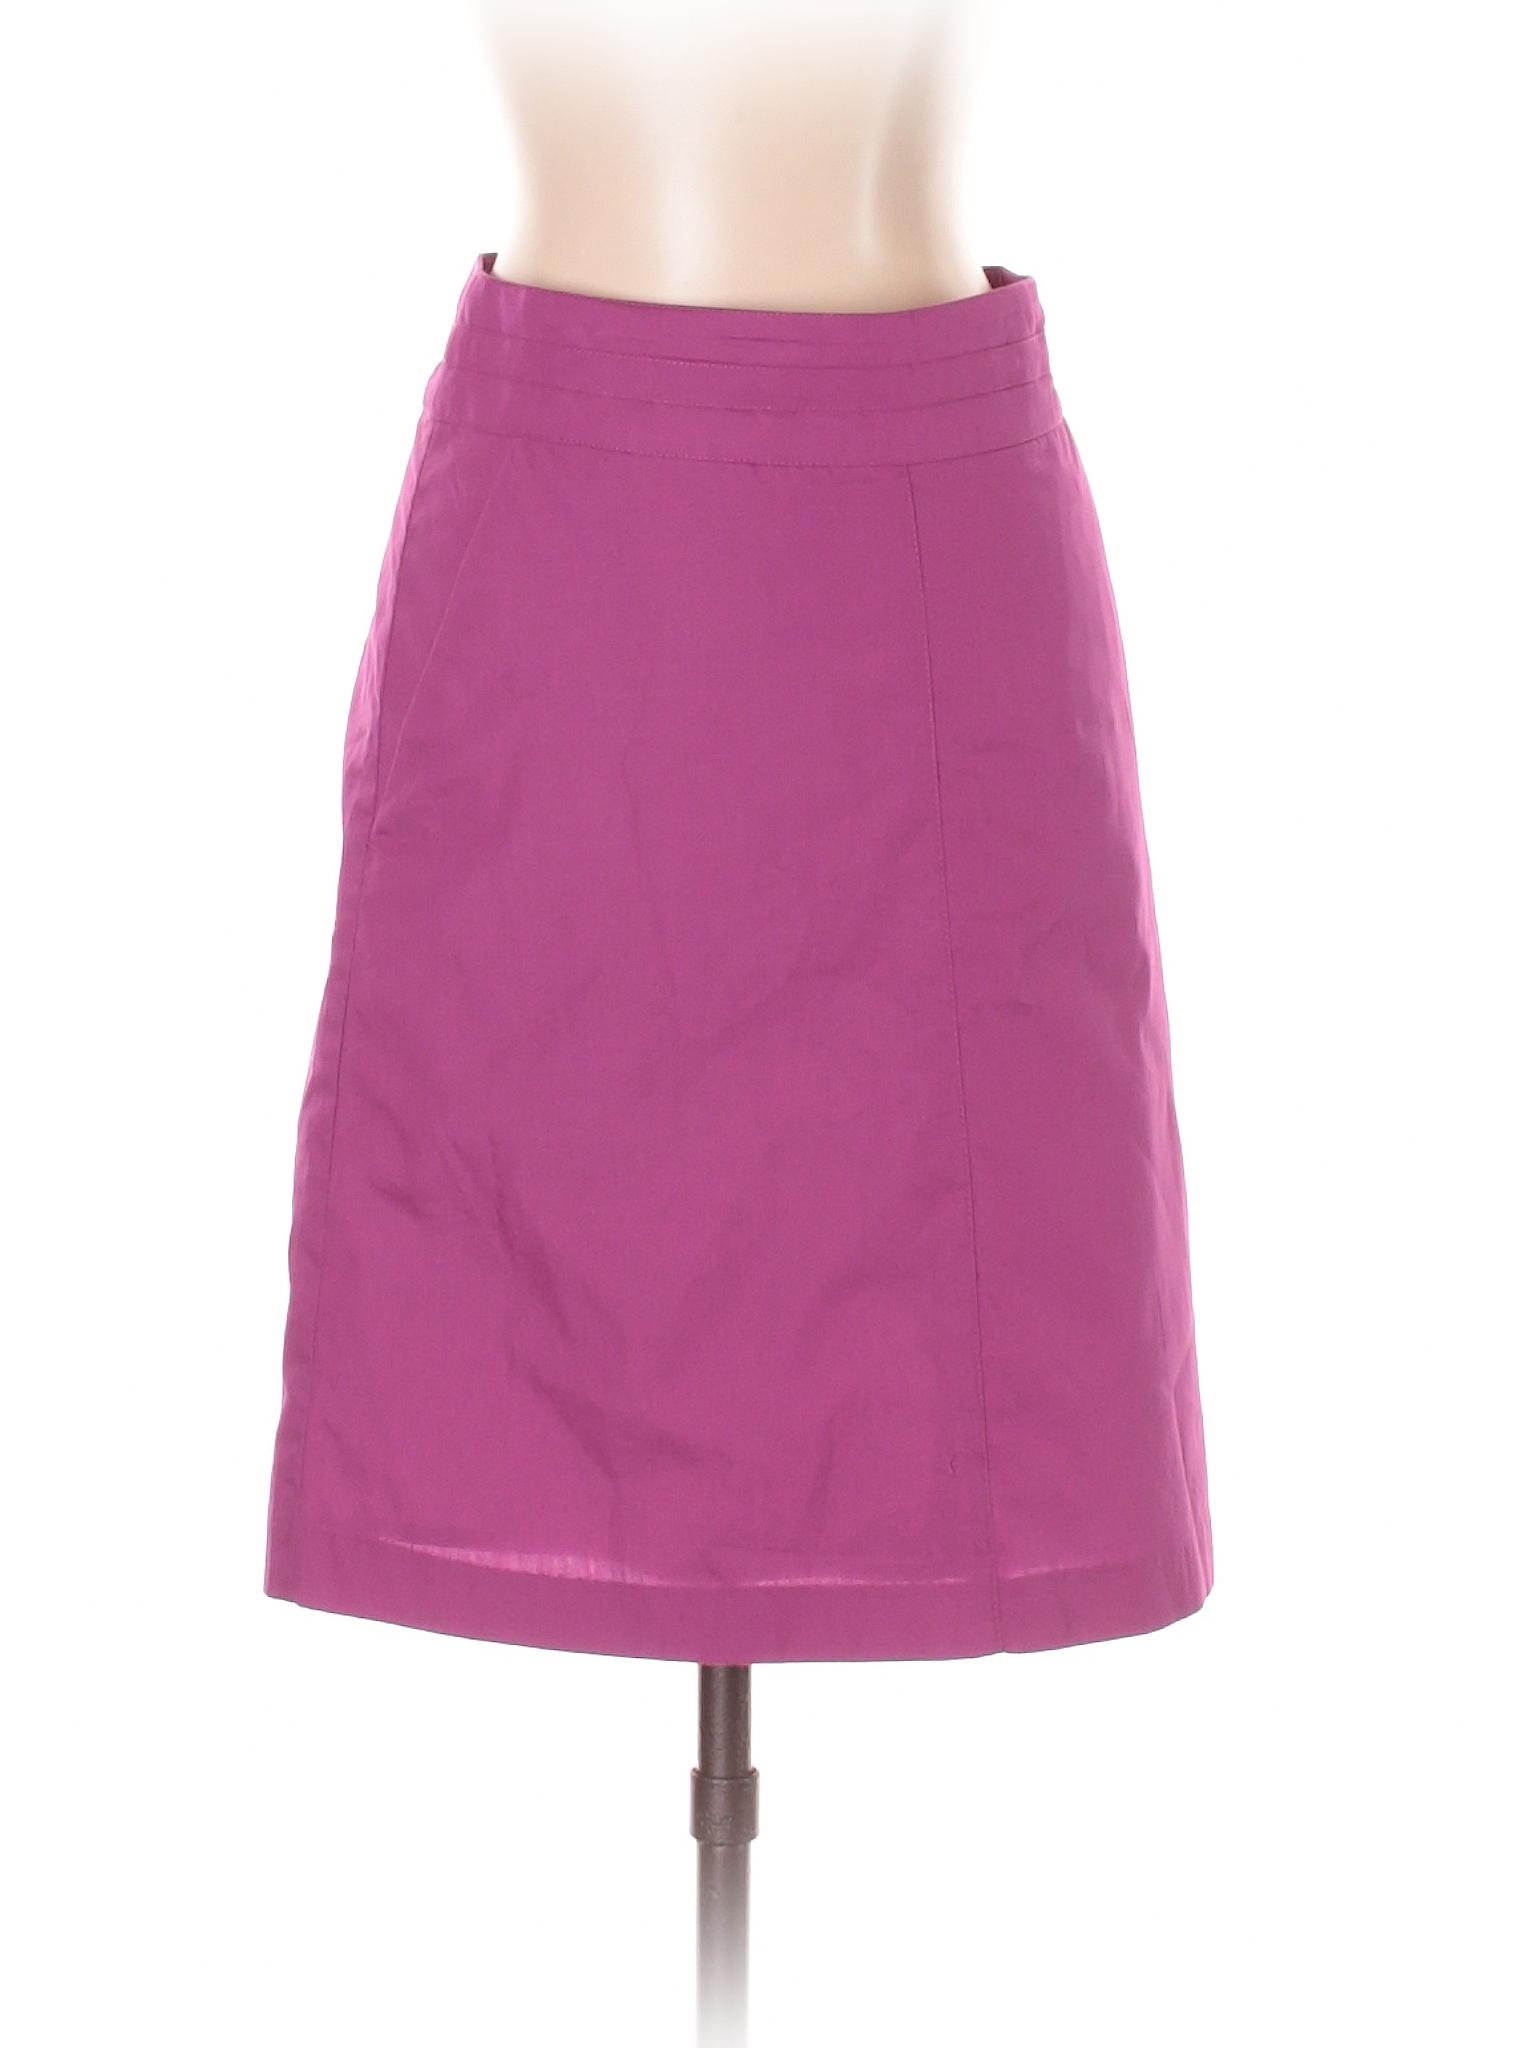 Boutique Skirt Casual Boutique Casual Boutique Casual Skirt Boutique Skirt Casual Skirt Boutique Casual 1g58Rwxqw